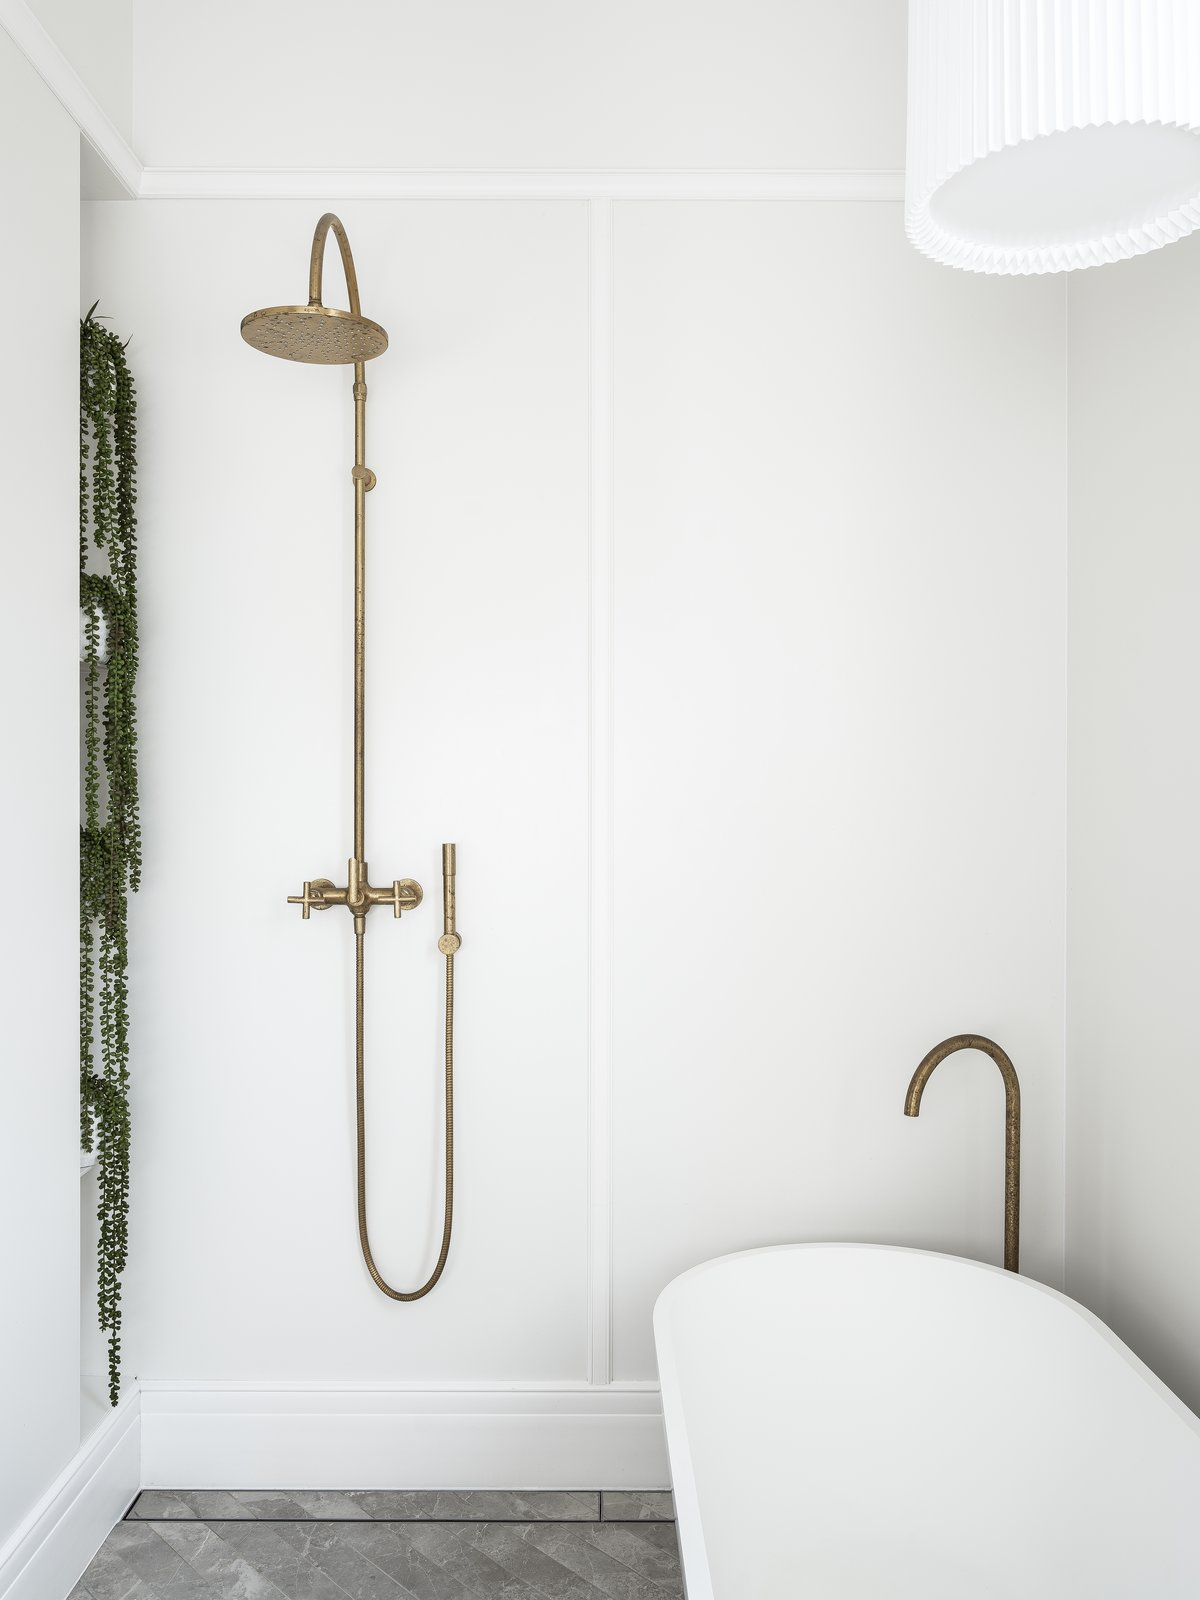 Bath, Ceramic Tile, Ceiling, Freestanding, Pendant, Open, and Accent  Bath Pendant Accent Photos from Black Pivot Doors Frame Views of This Australian Home's Verdant Garden